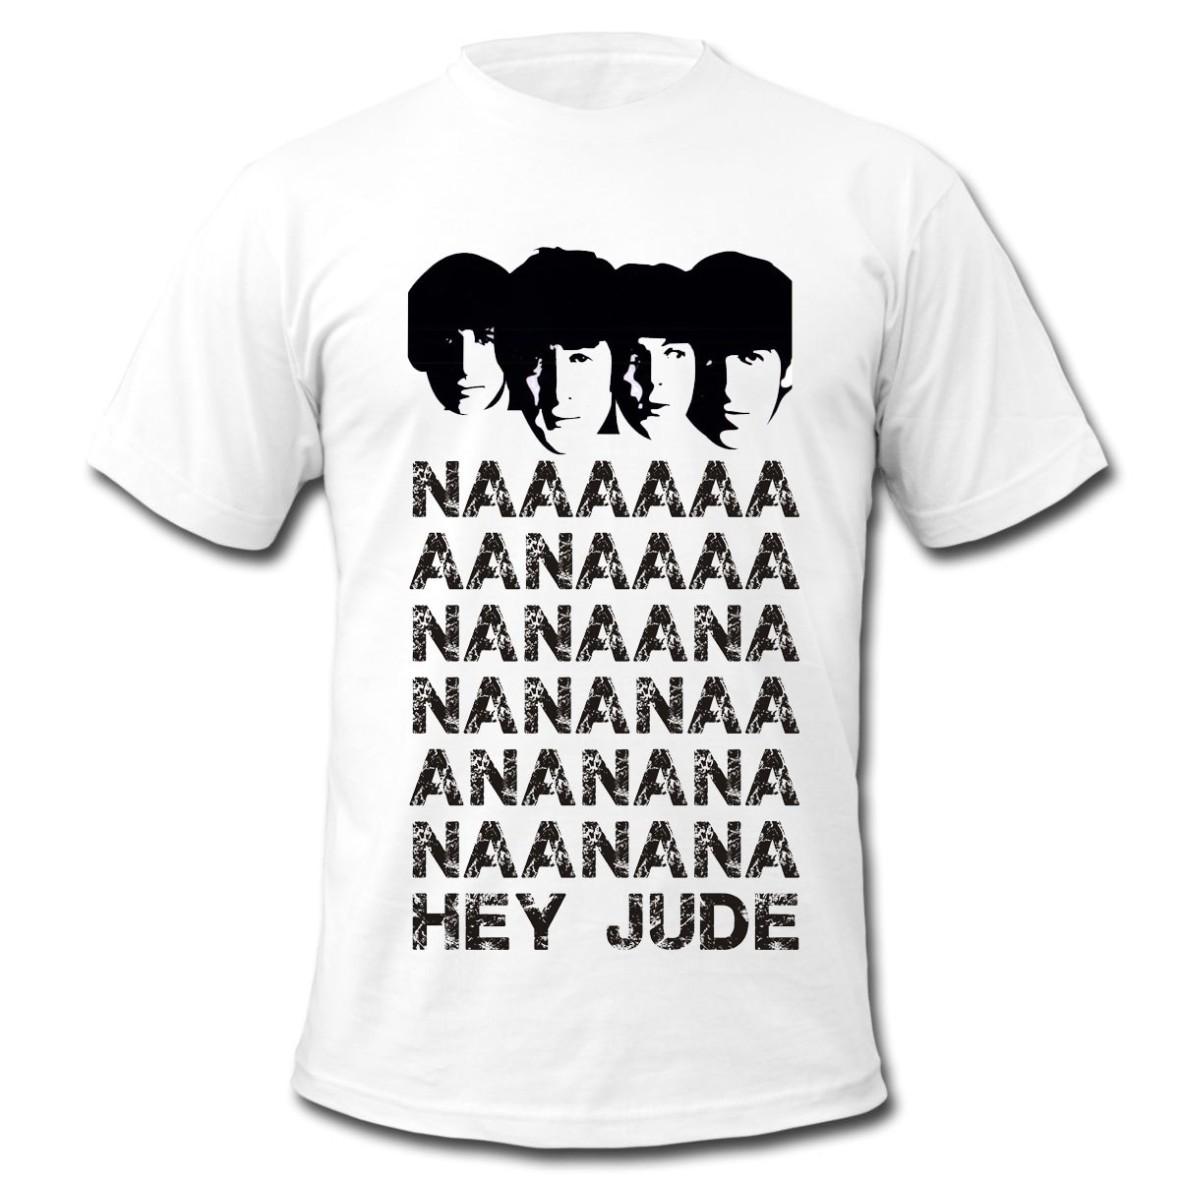 The Beatles | Hey Jude T-Shirt